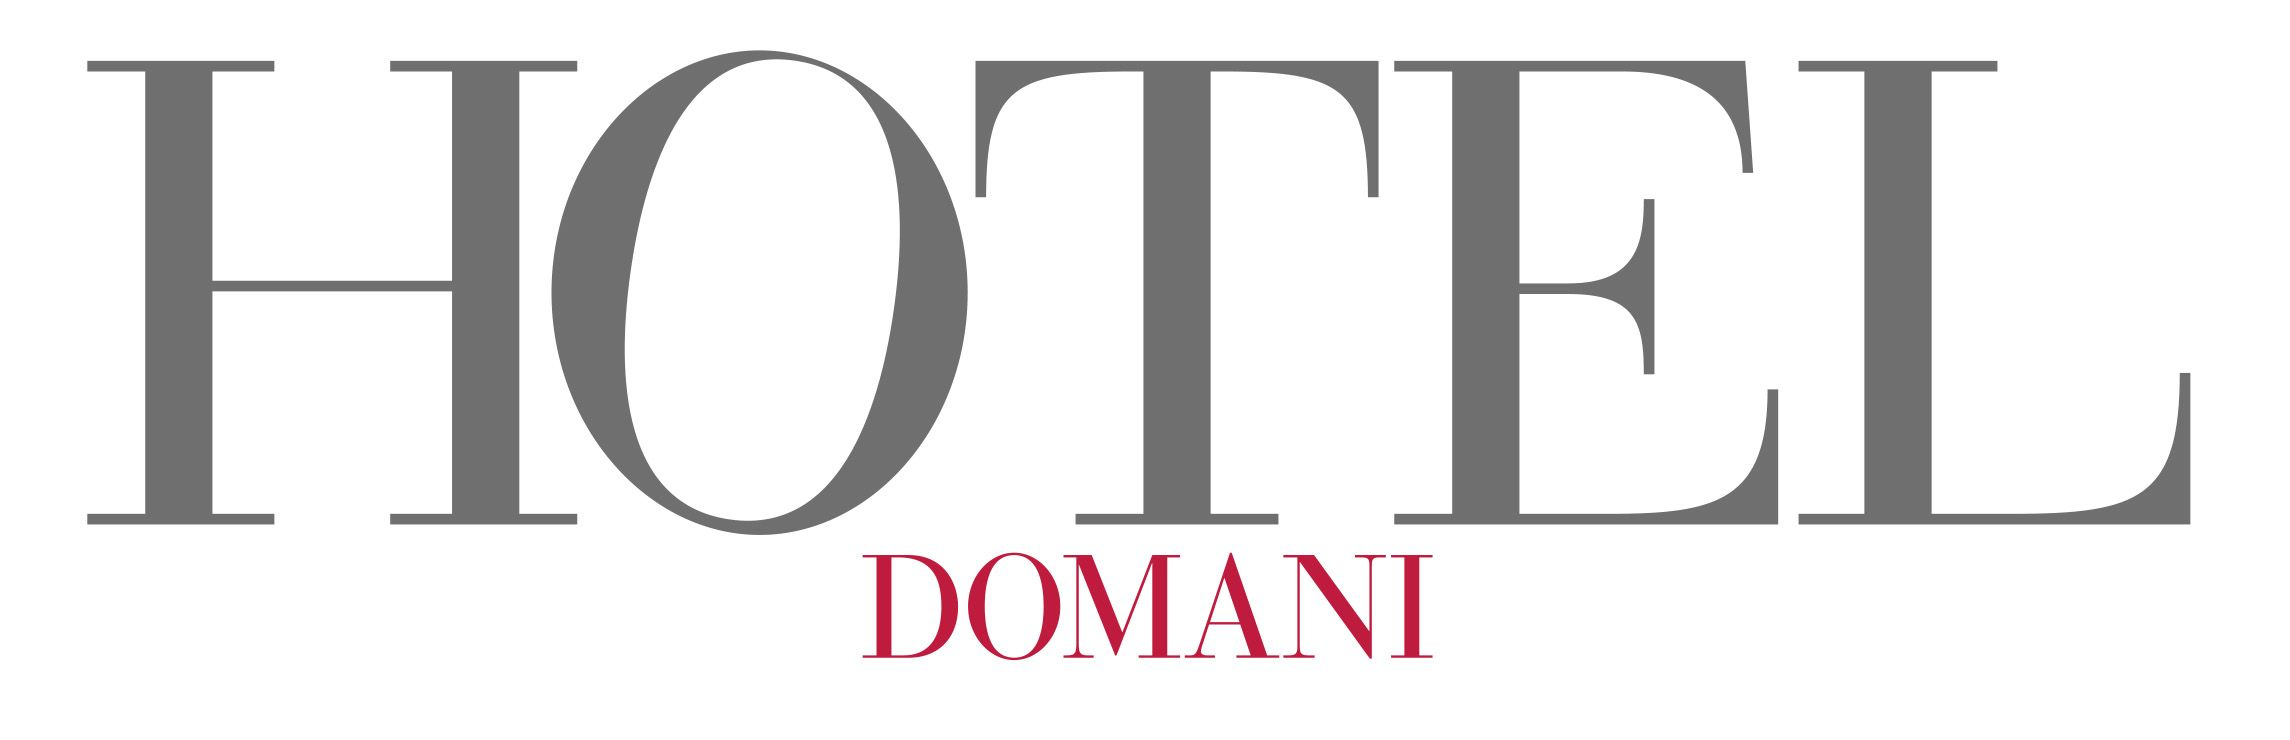 http://www.buytourismonline.com/wp-content/uploads/2013/07/1_HotelDomani_testata.jpg